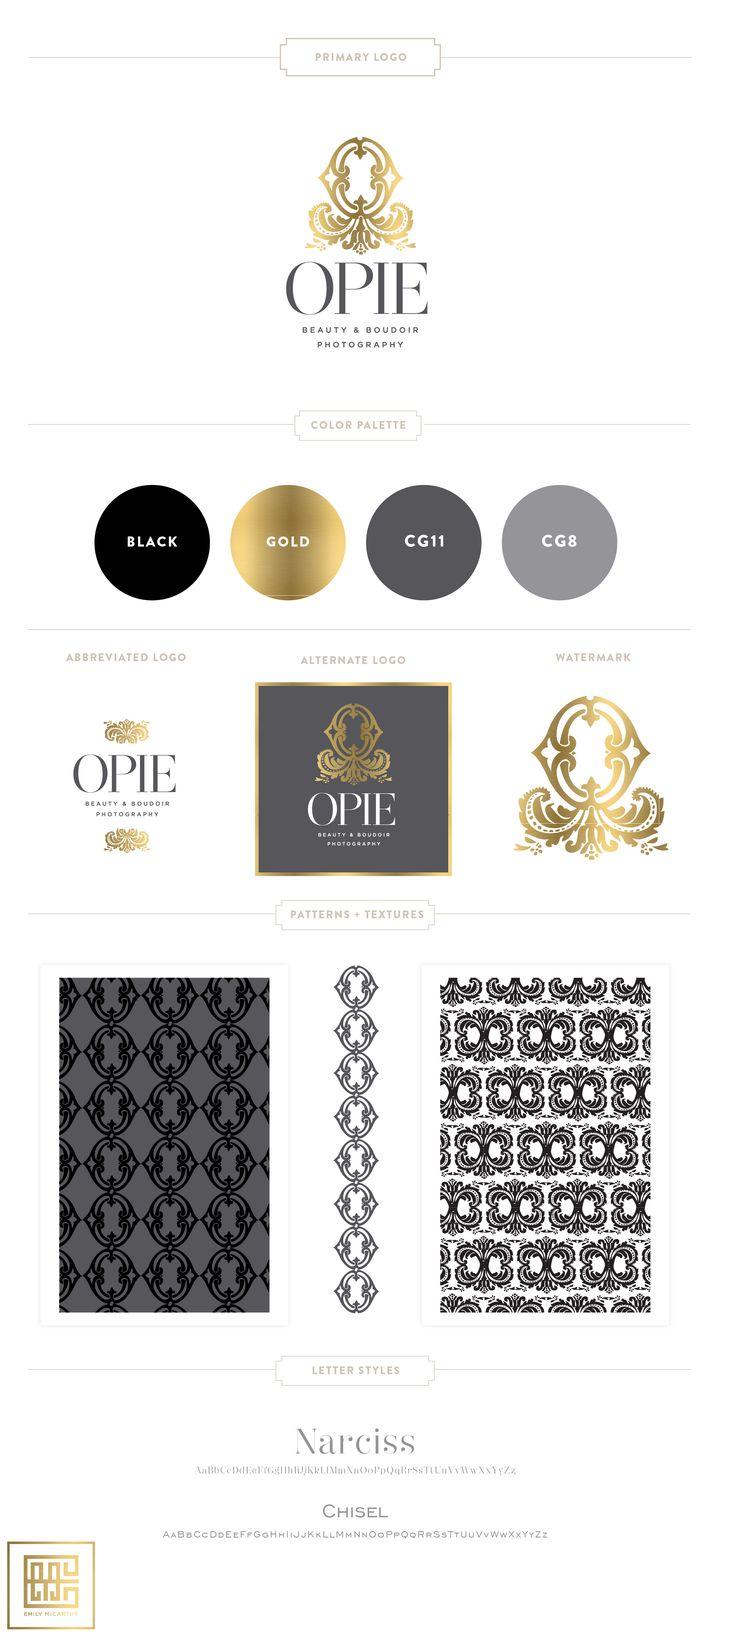 Tj initial luxury ornament monogram logo stock vector - Clean And Crisp Presentation Of Logo And Pallete